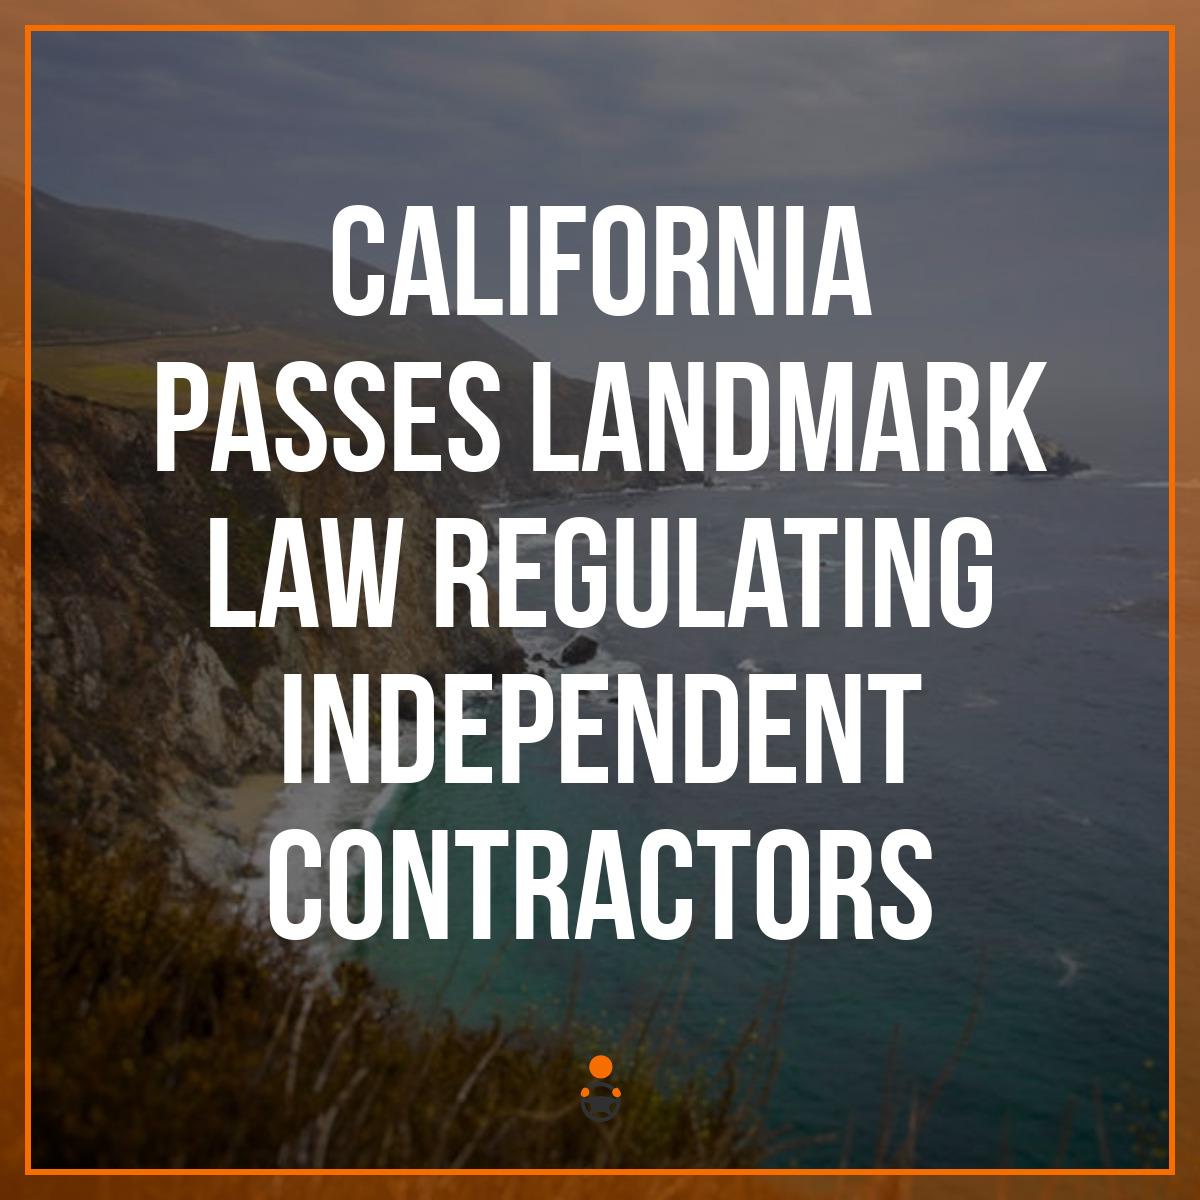 California Passes Landmark Law Regulating Independent Contractors